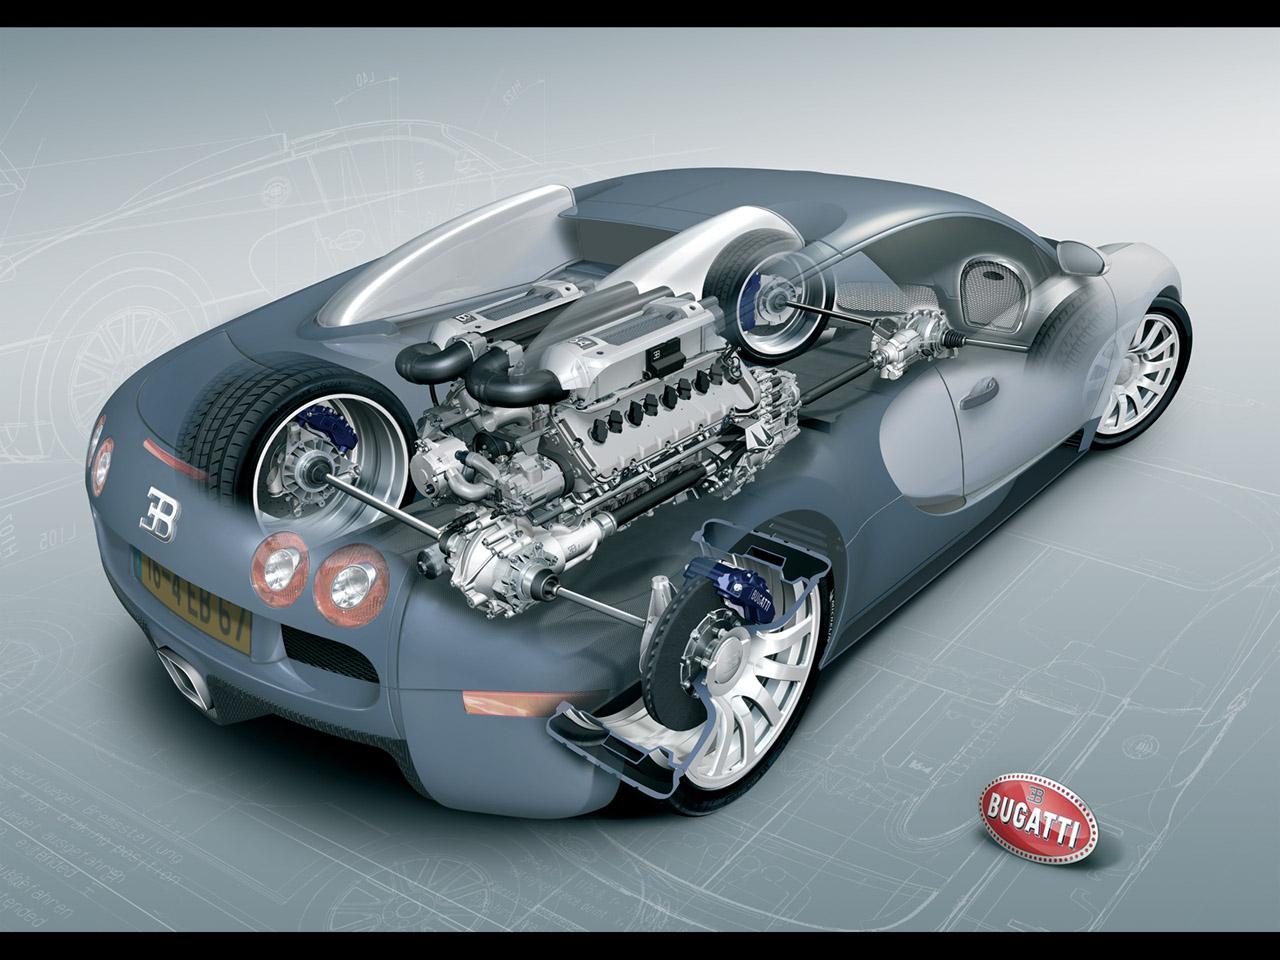 Luxury Vehicle: Best Car Guide, Best Car Gallery: Bugatti Veyron Engine